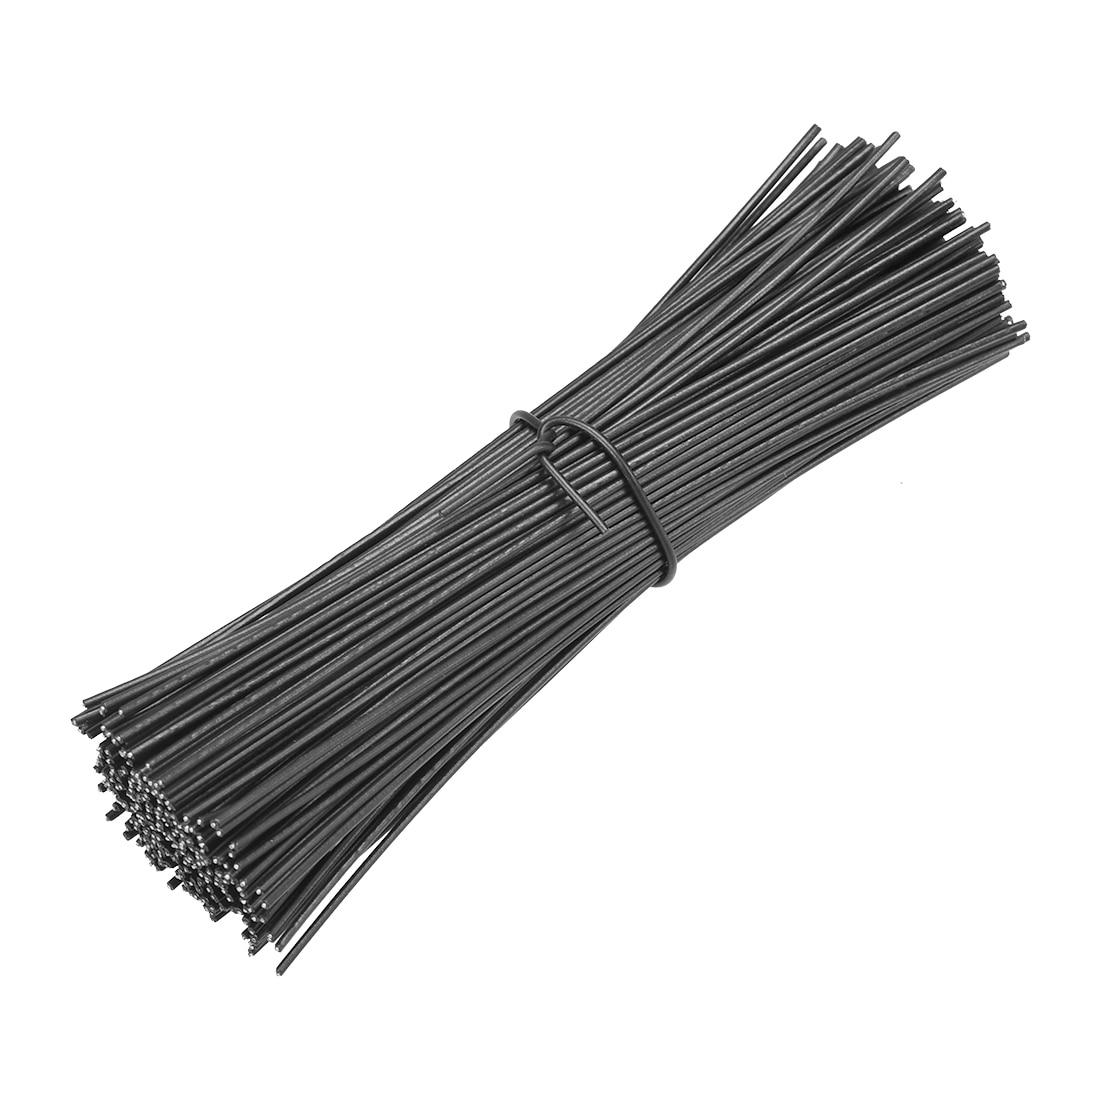 Uxcell 500pcs 100mm 120mm 150mm 200mm Metallic Twist Ties 1mm 1.8mm Width Black White Plastic Cable Cord Ties